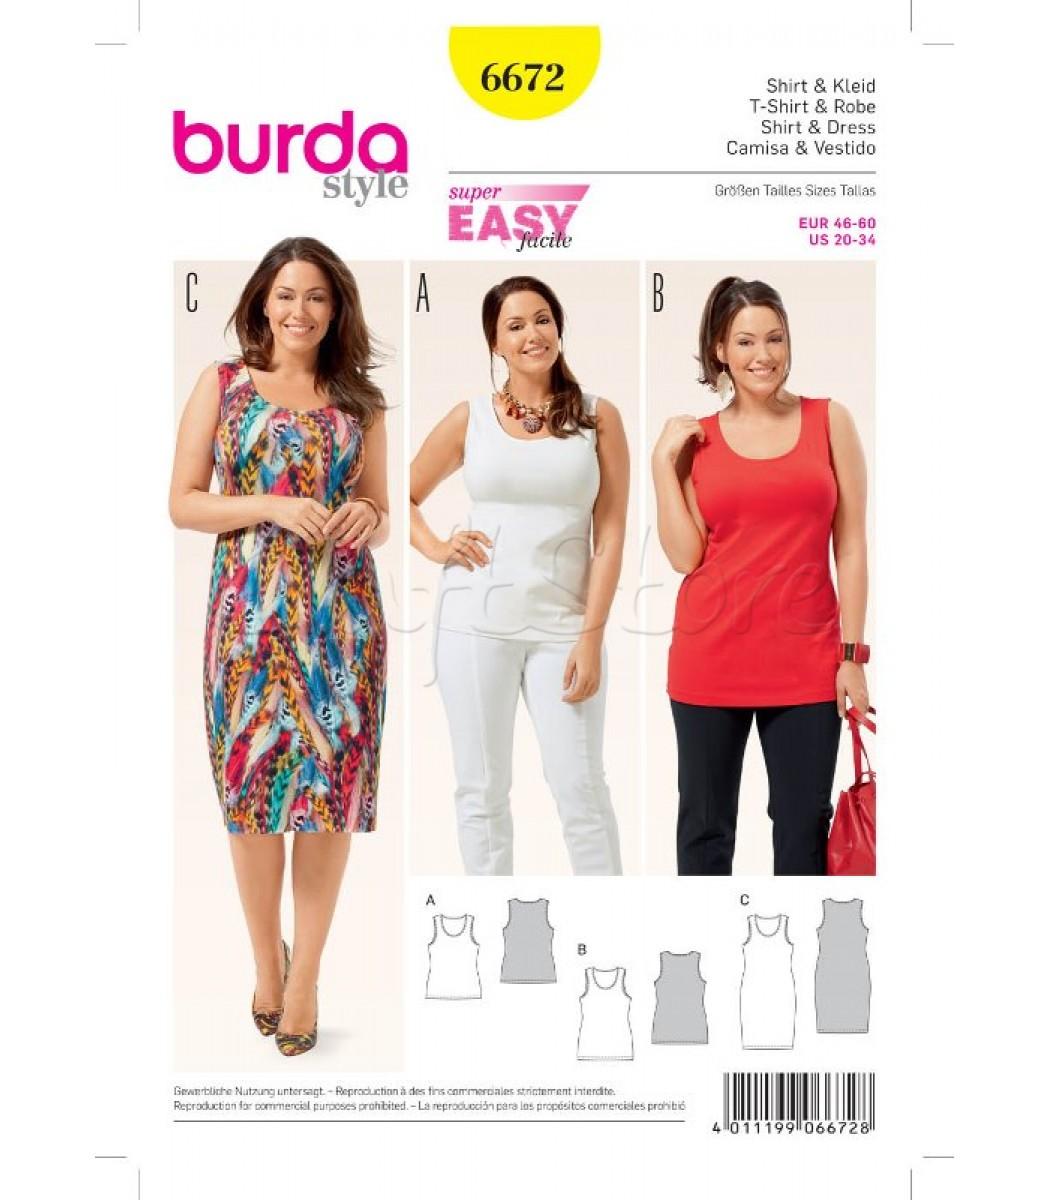 5da5390edb3 Burda Πατρόν Μπλούζες-Φόρεμα 6672| Ραπτική | Burda